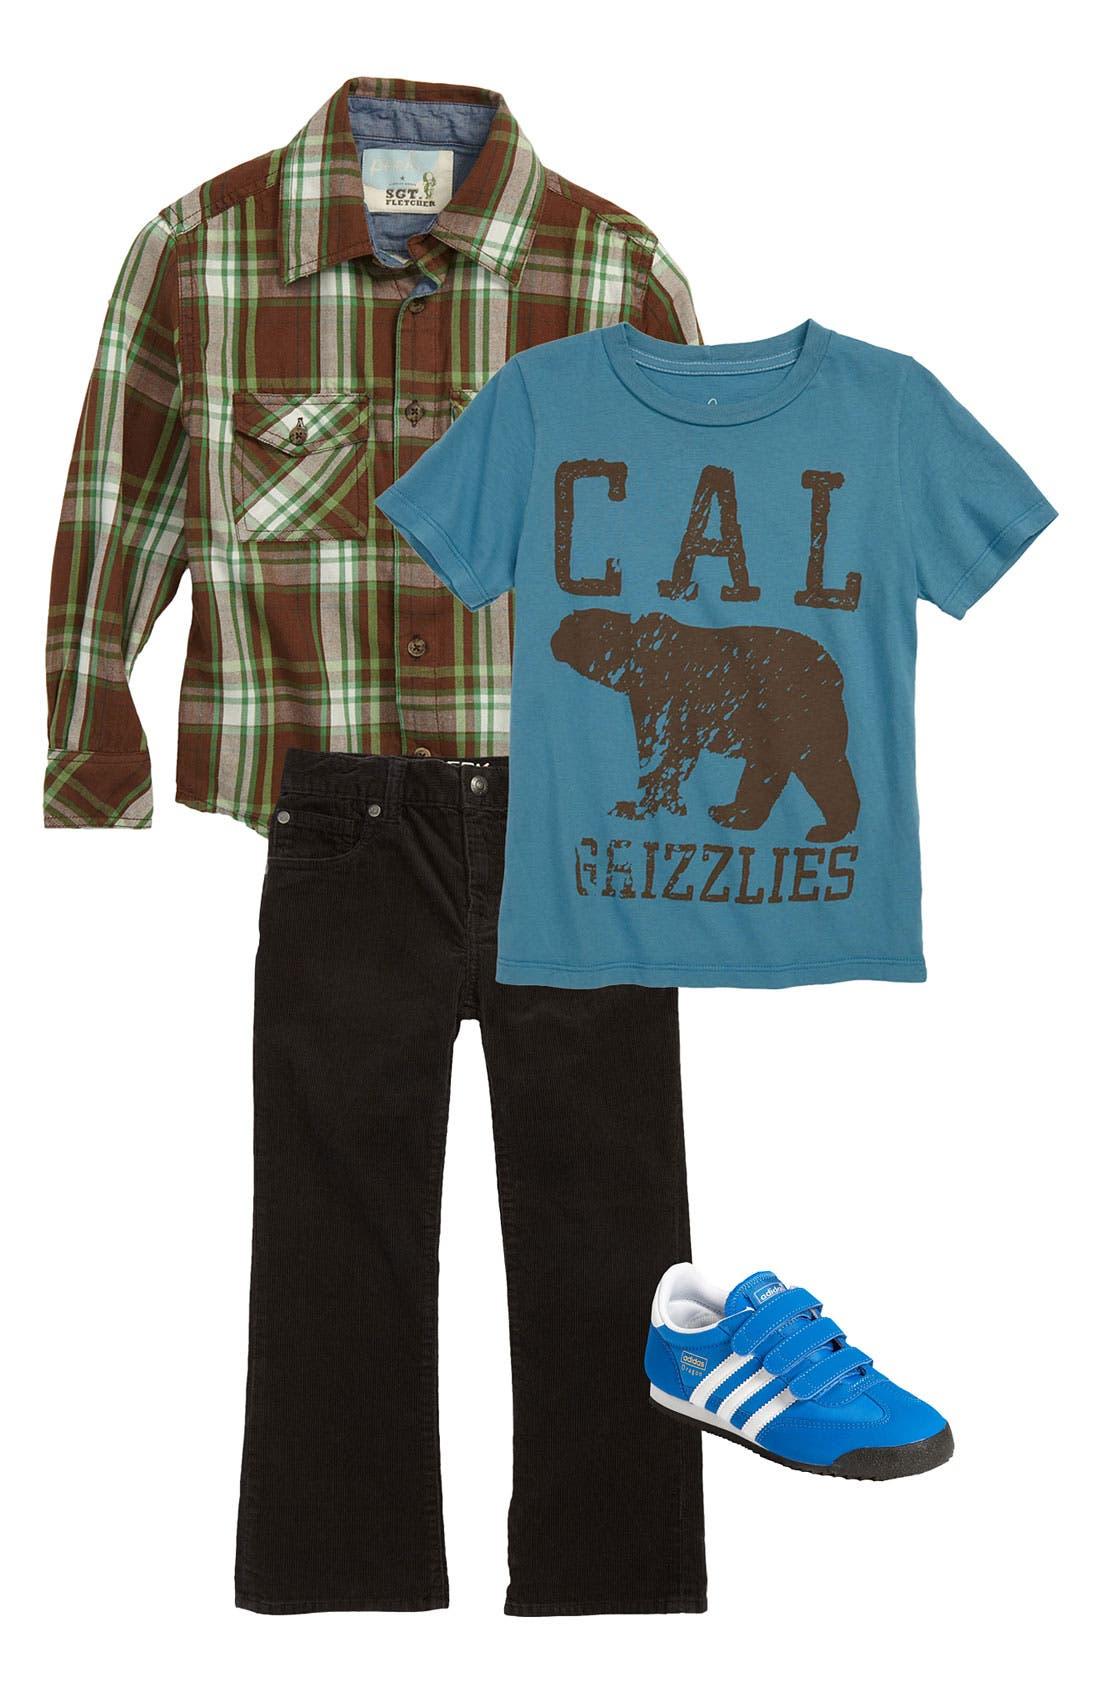 Main Image - Peek T-Shirt, Plaid Shirt & Jeans (Toddler, Little Boys & Big Boys)